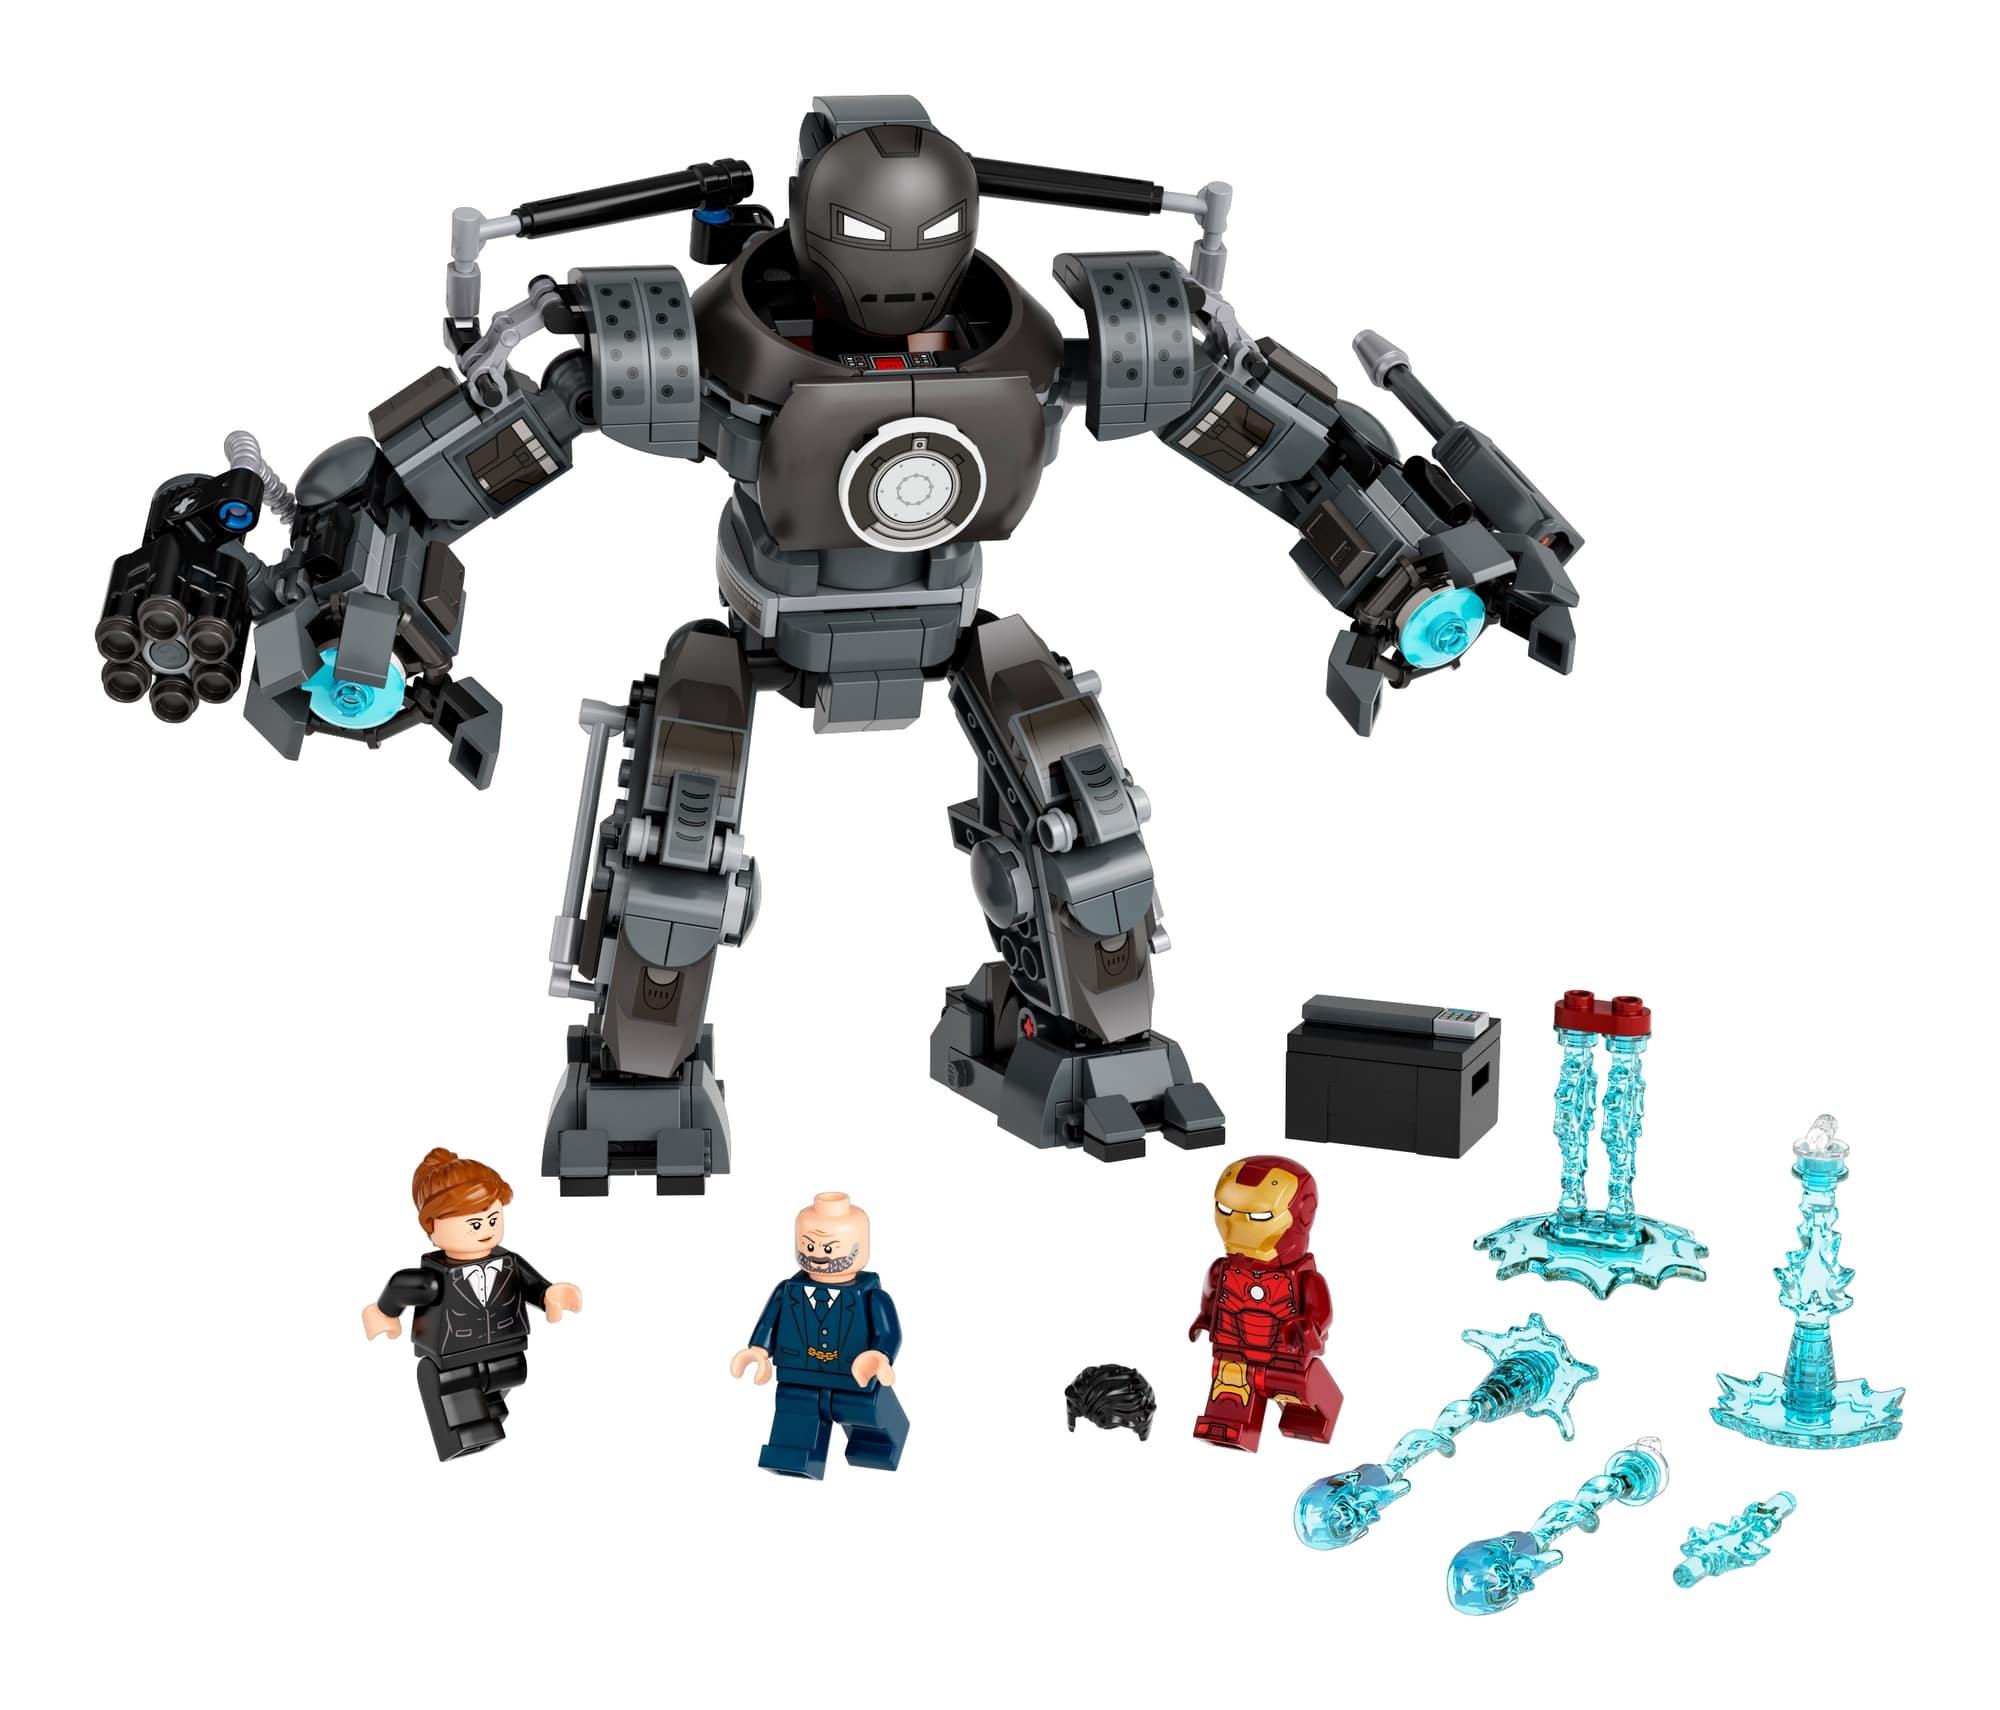 LEGO Marvel 76190 Iron Man Und Das Chaos Durch Iron Monger 1